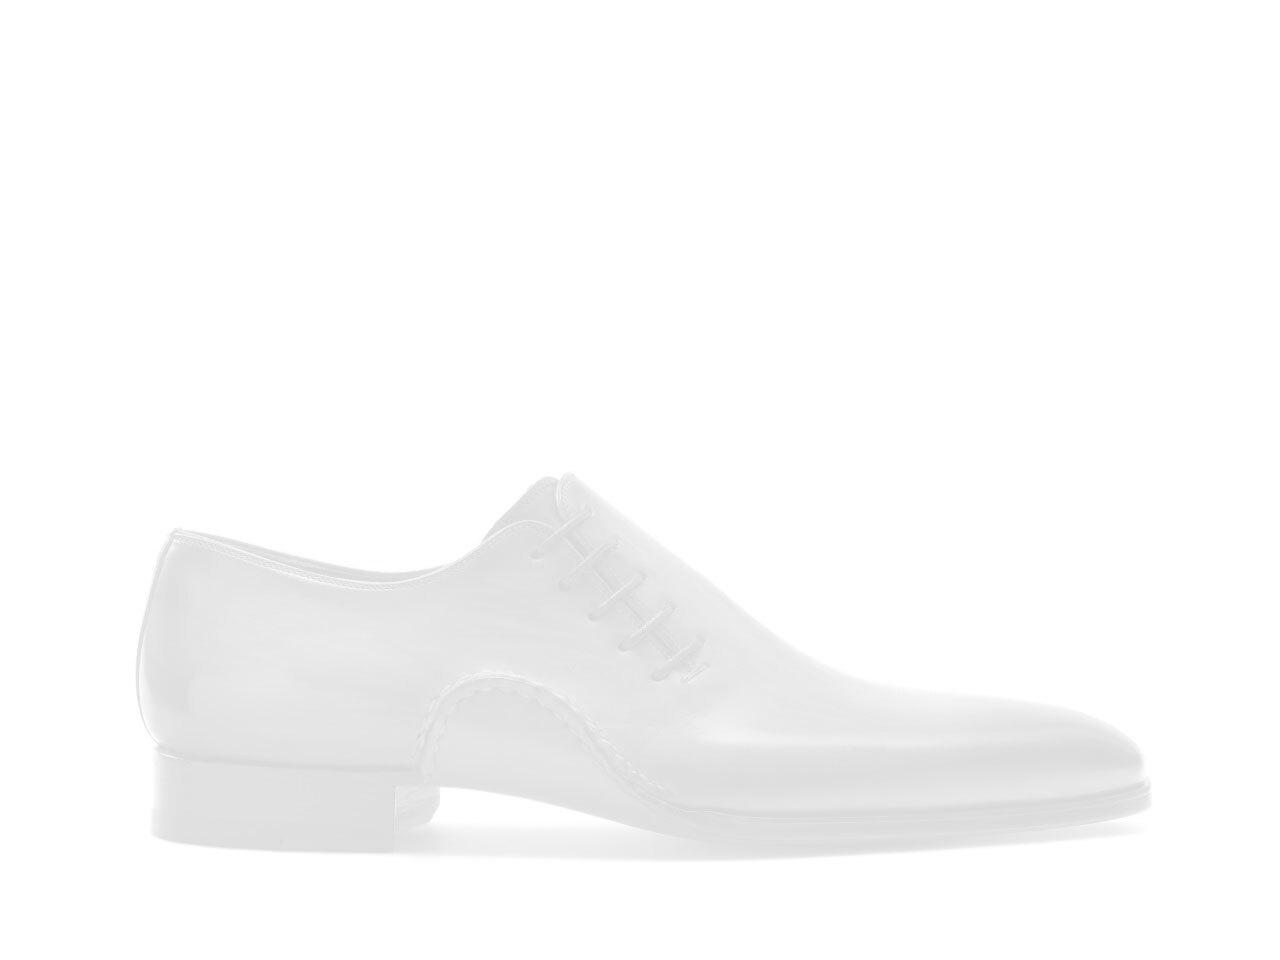 Sole of the Magnanni Nash Cuero Men's Sneakers